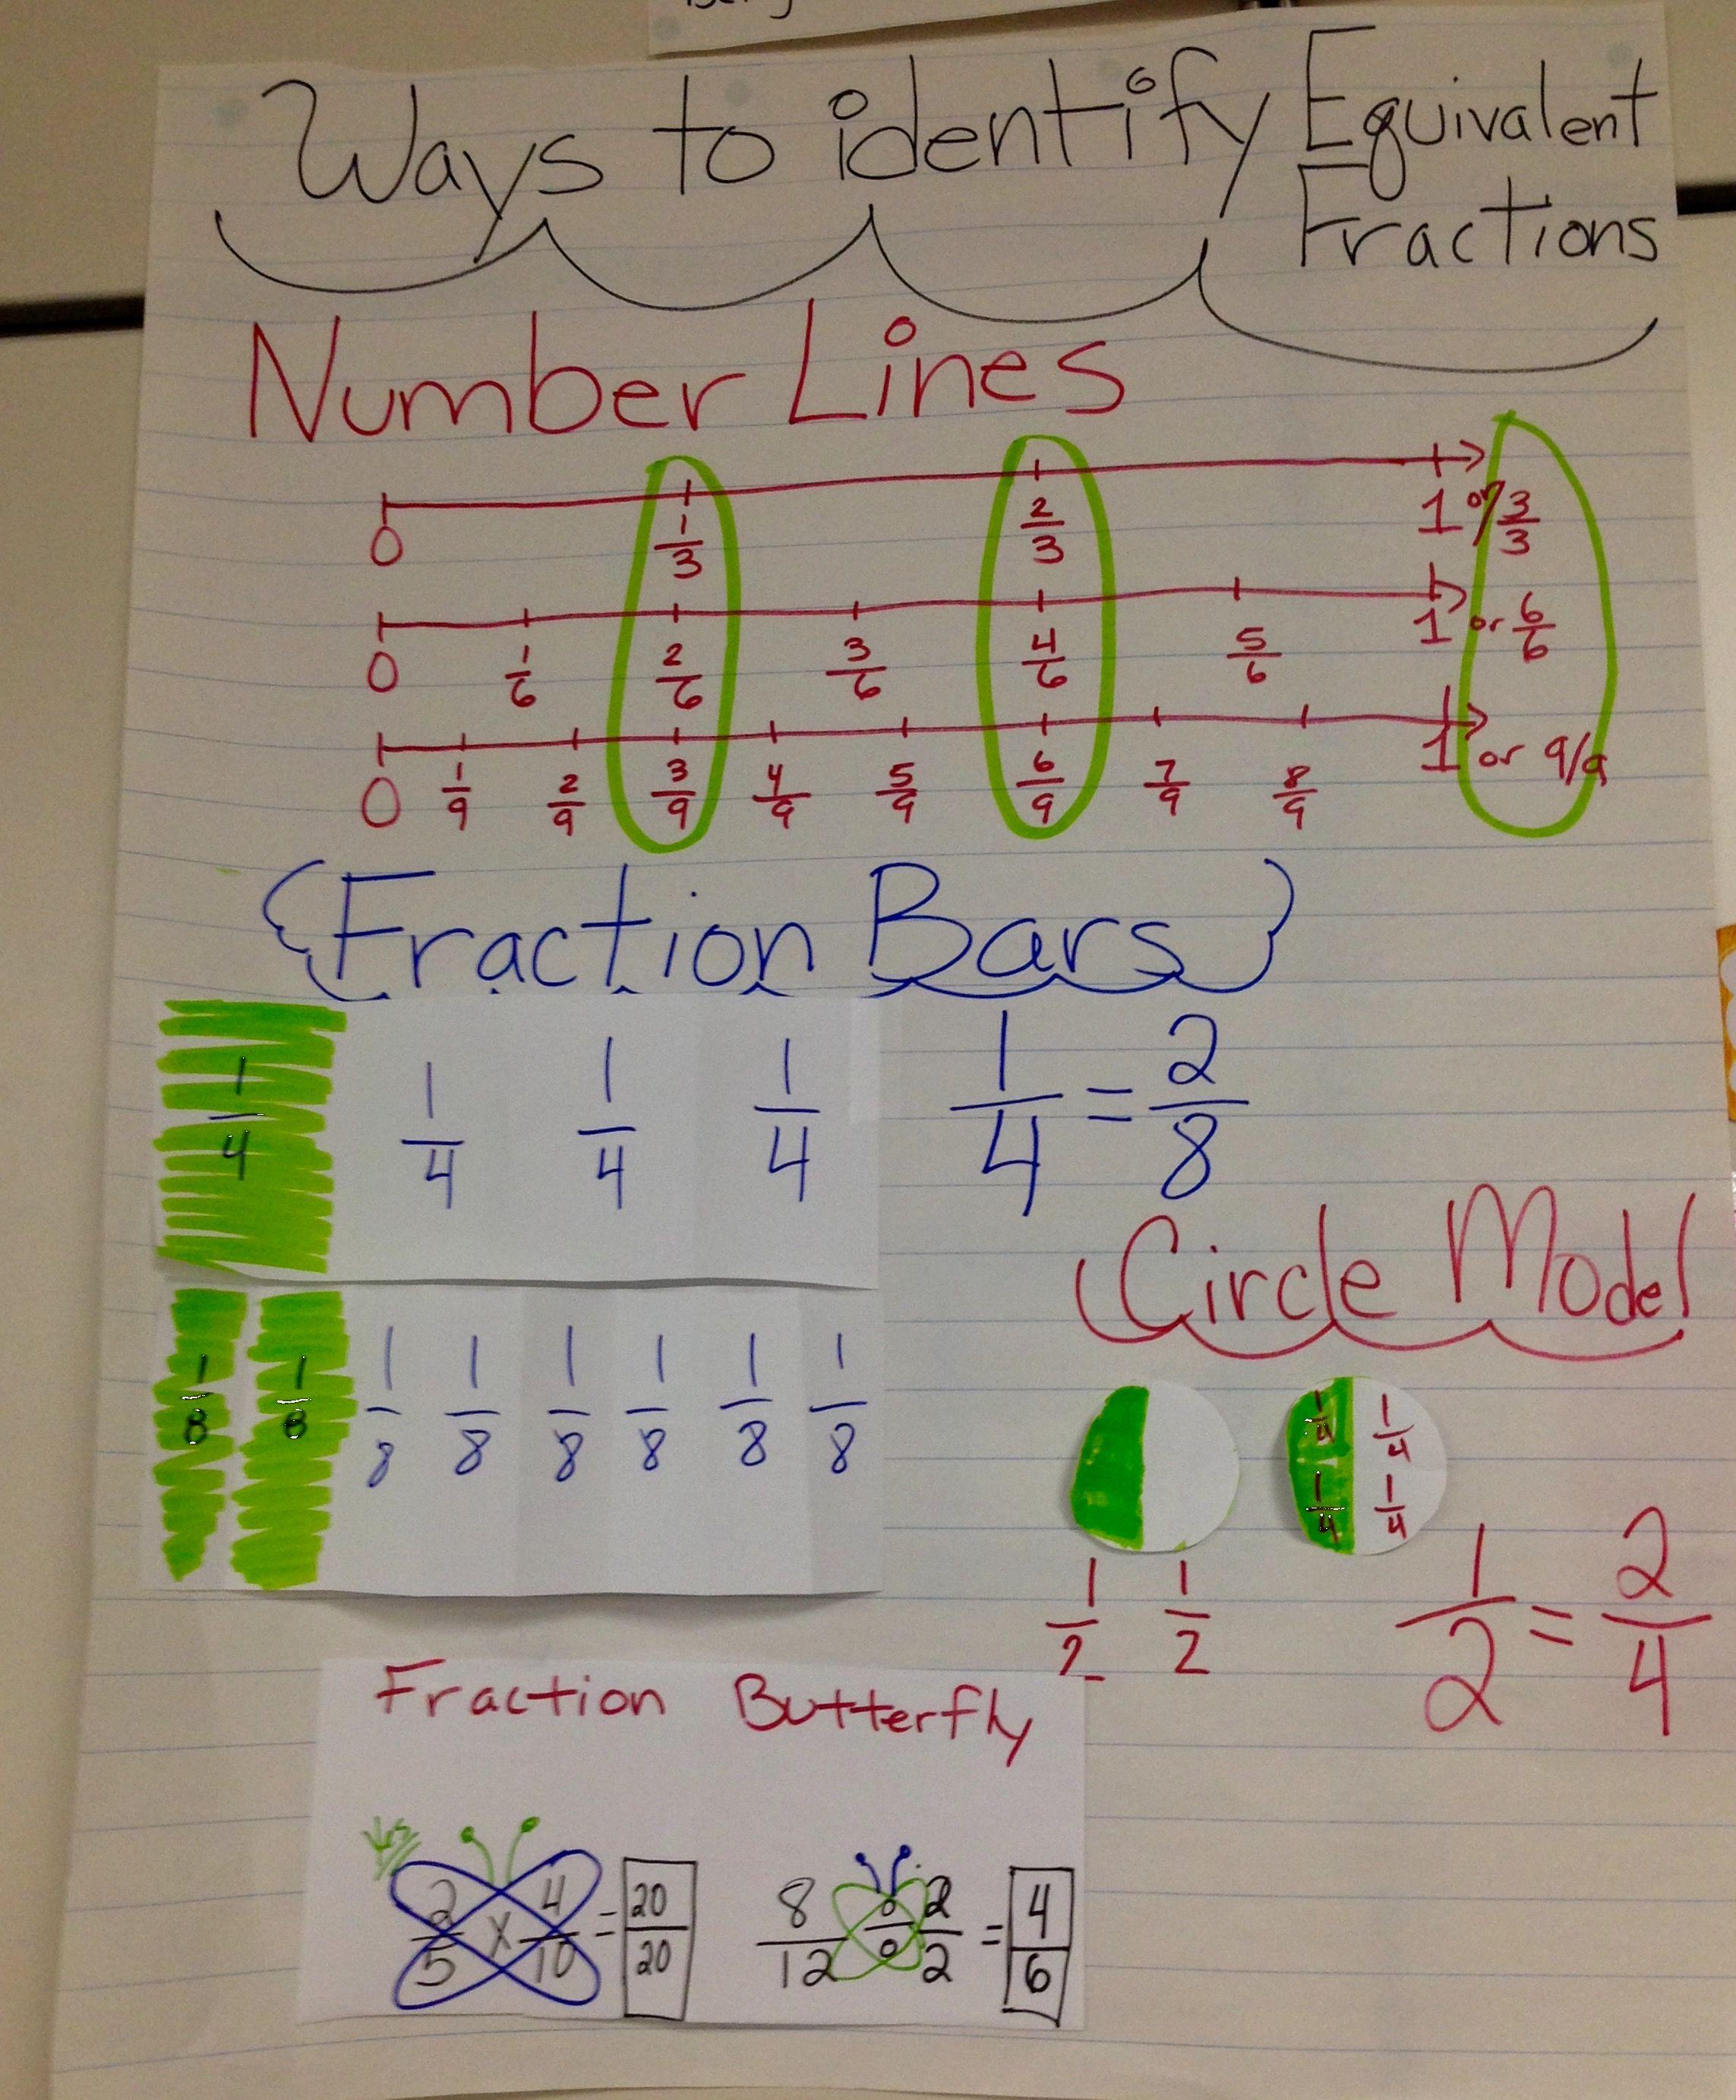 equivalent fractions anchor chart: fraction bars, circle model